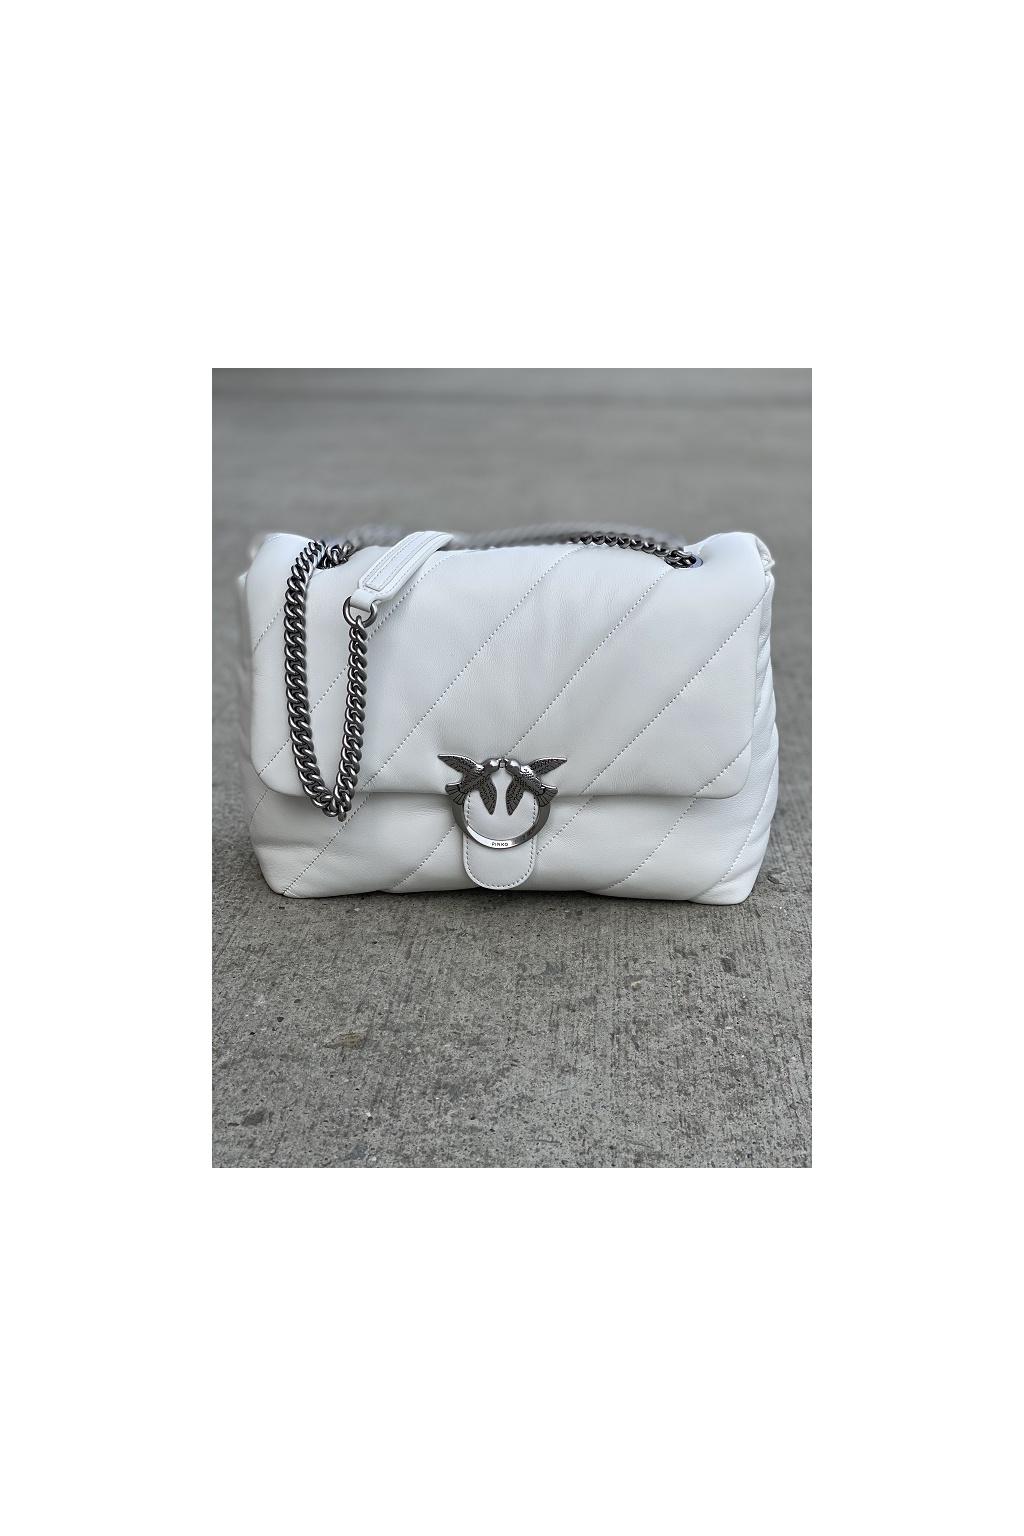 Dámská kabelka Pinko Love Big Puff Maxi Quilt 3 Cl bílá